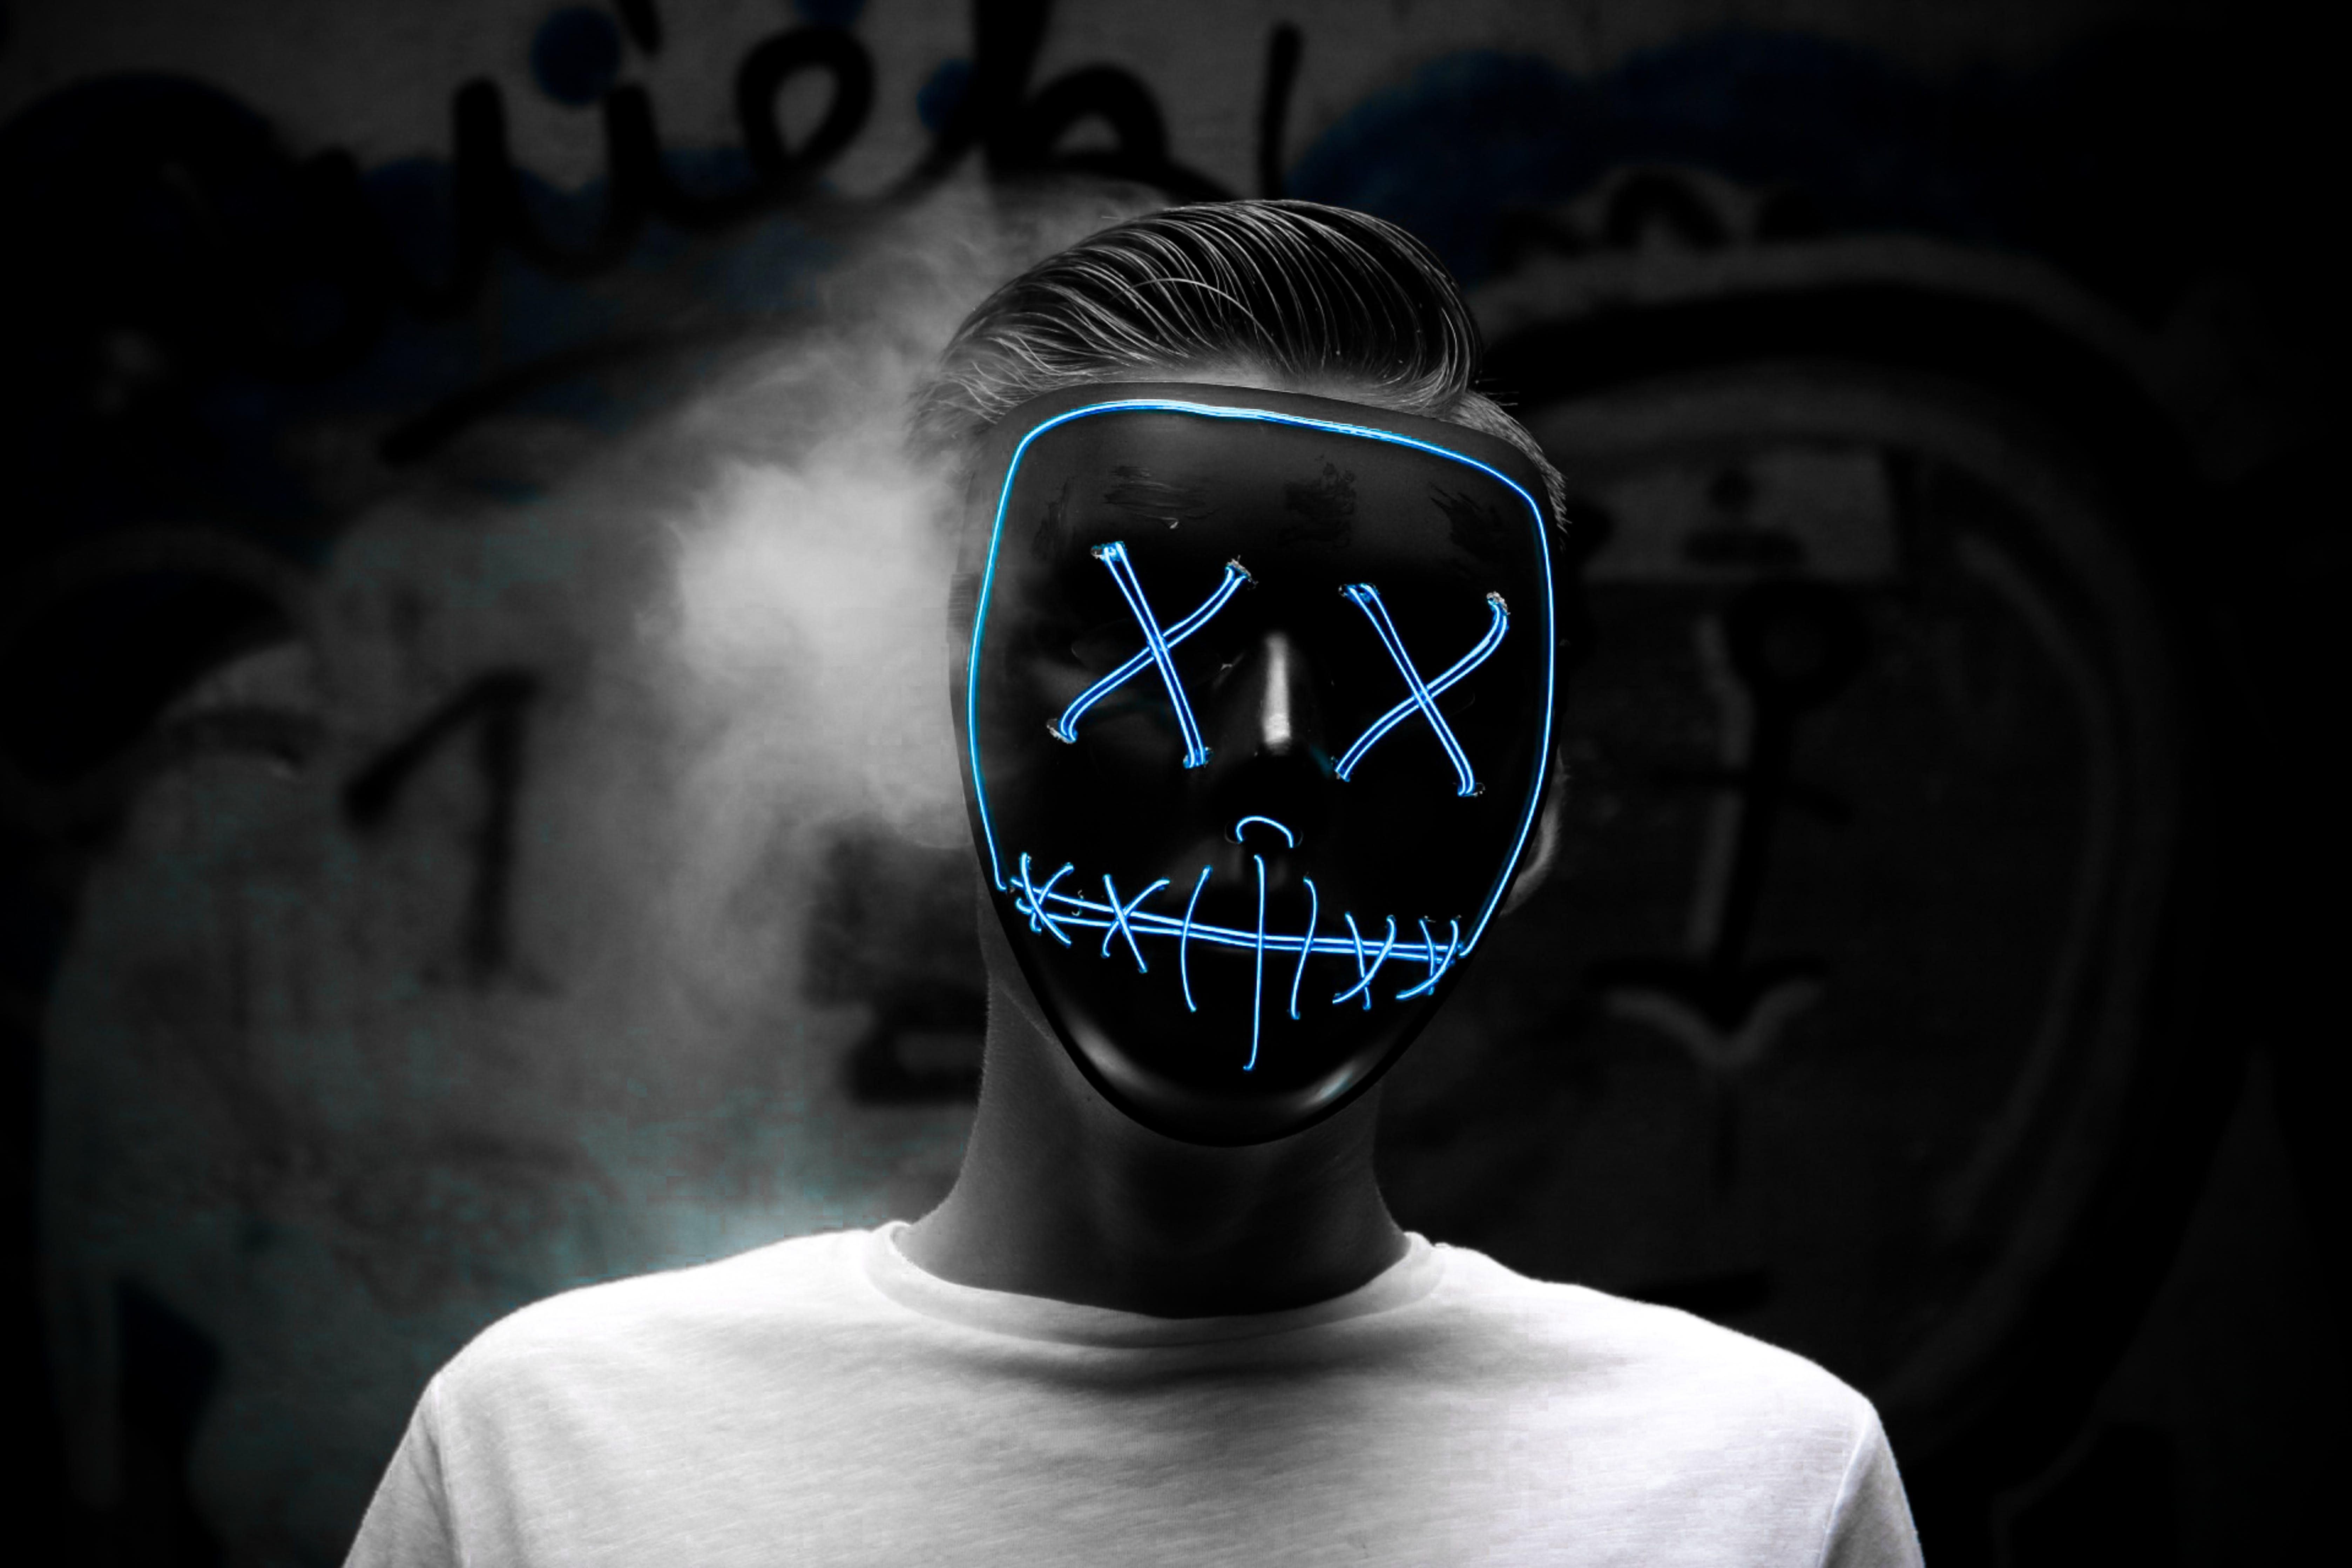 Grayscale Photo of Man Wearing Blue Mask